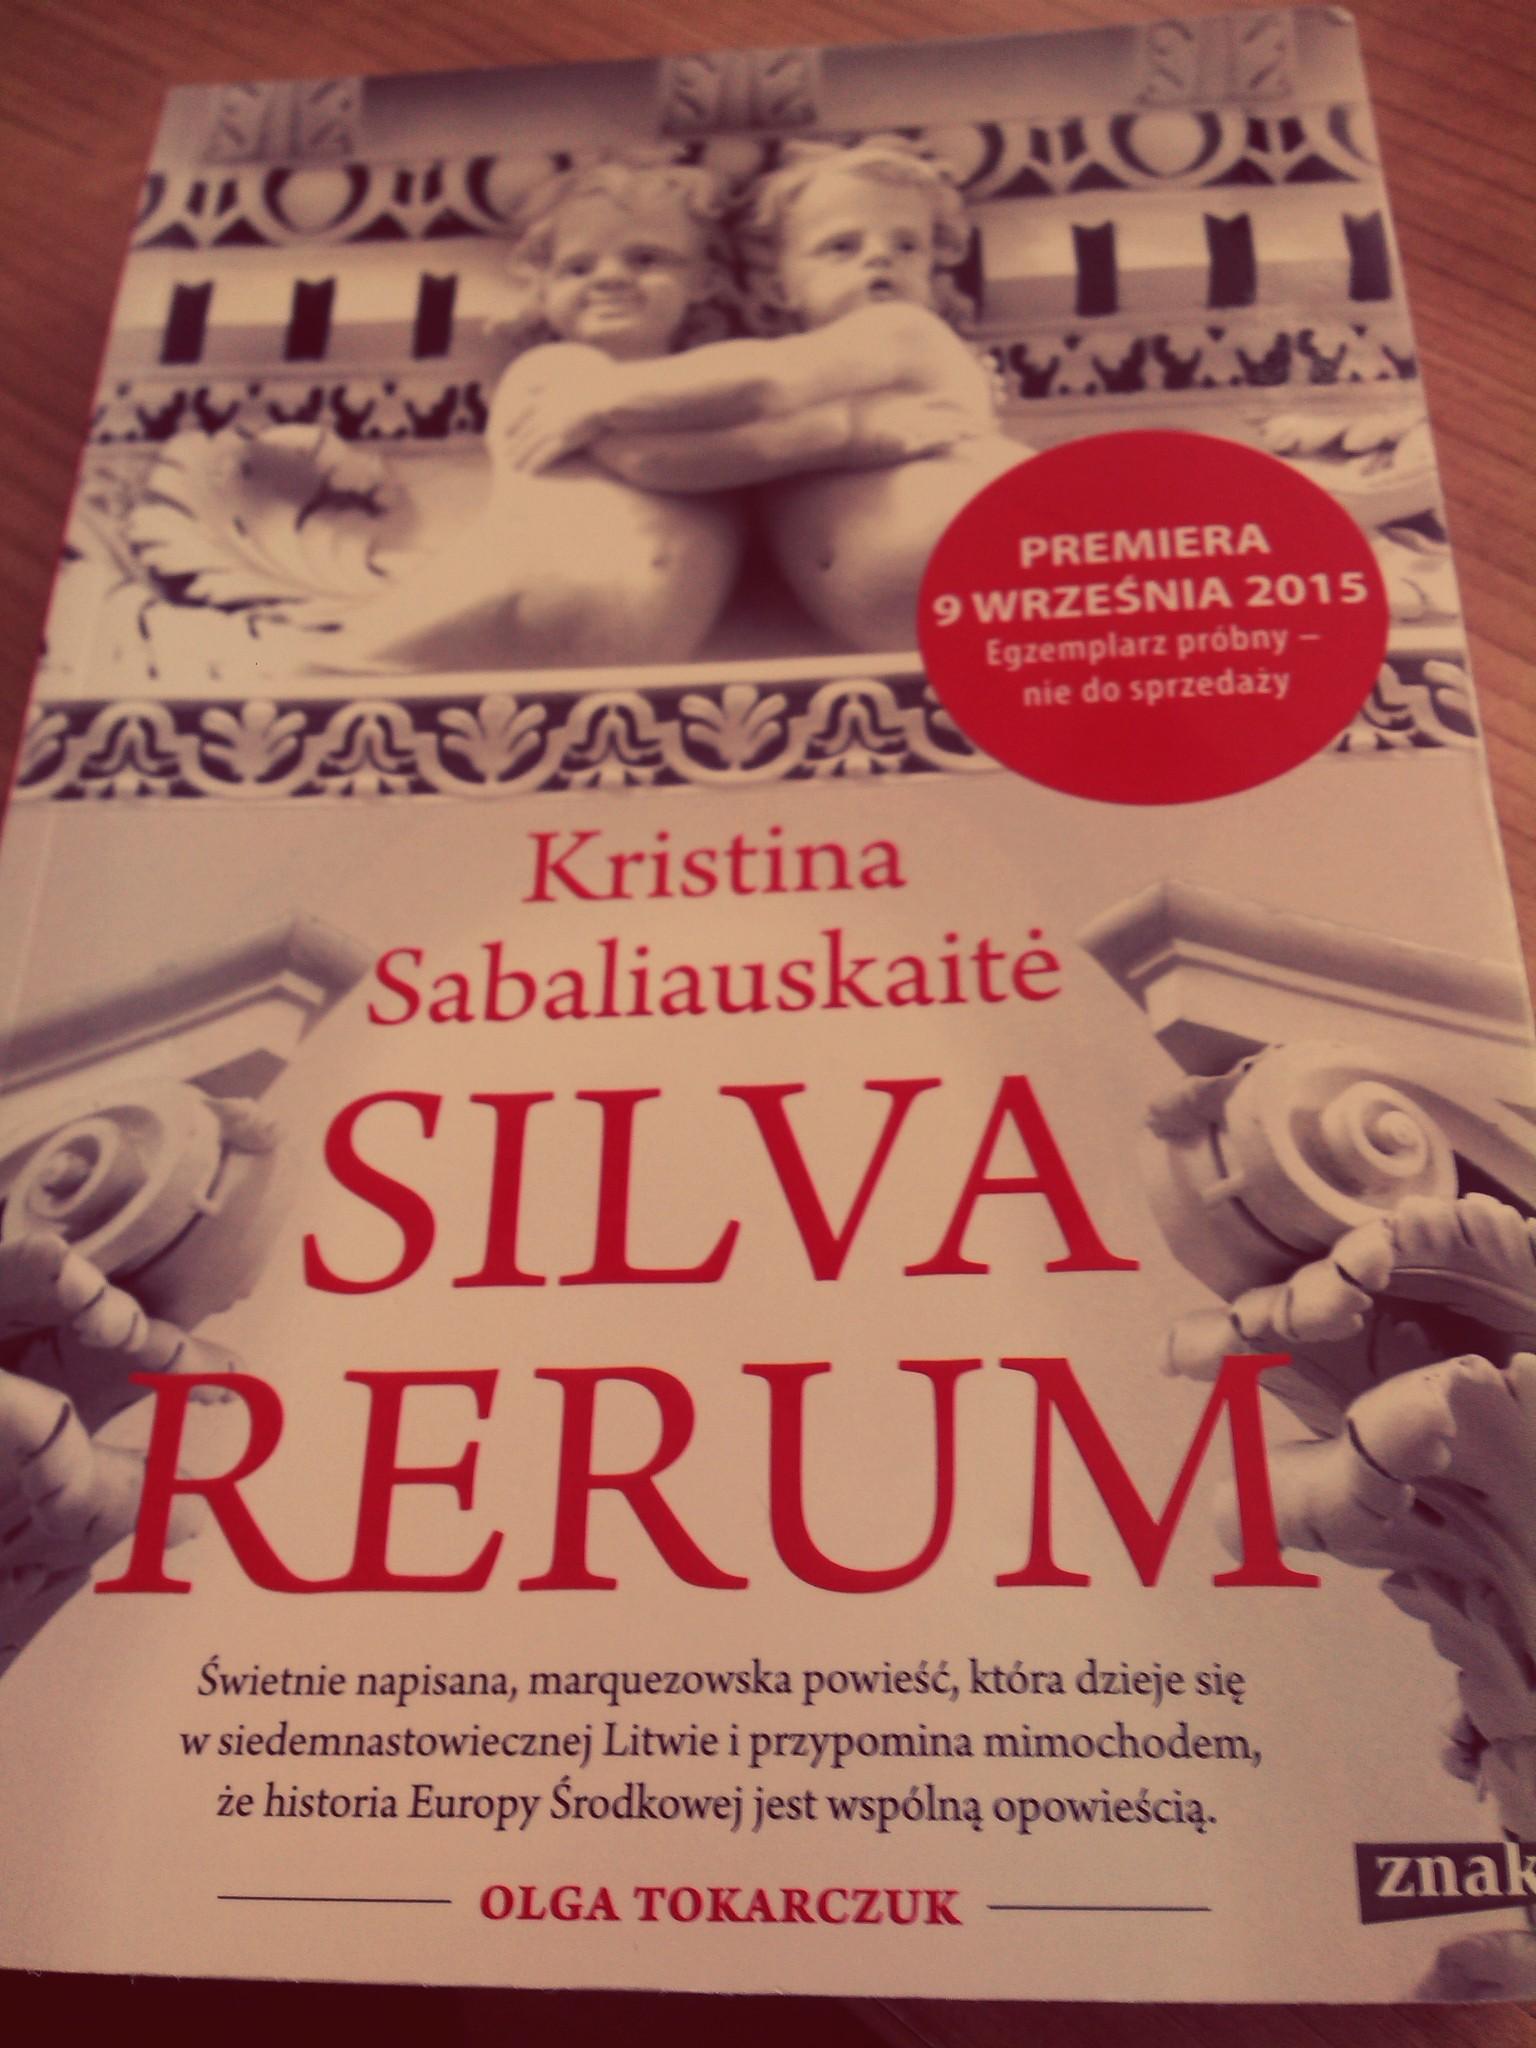 Silva Rerum Recenzja Ksiazki Zazyjkultury